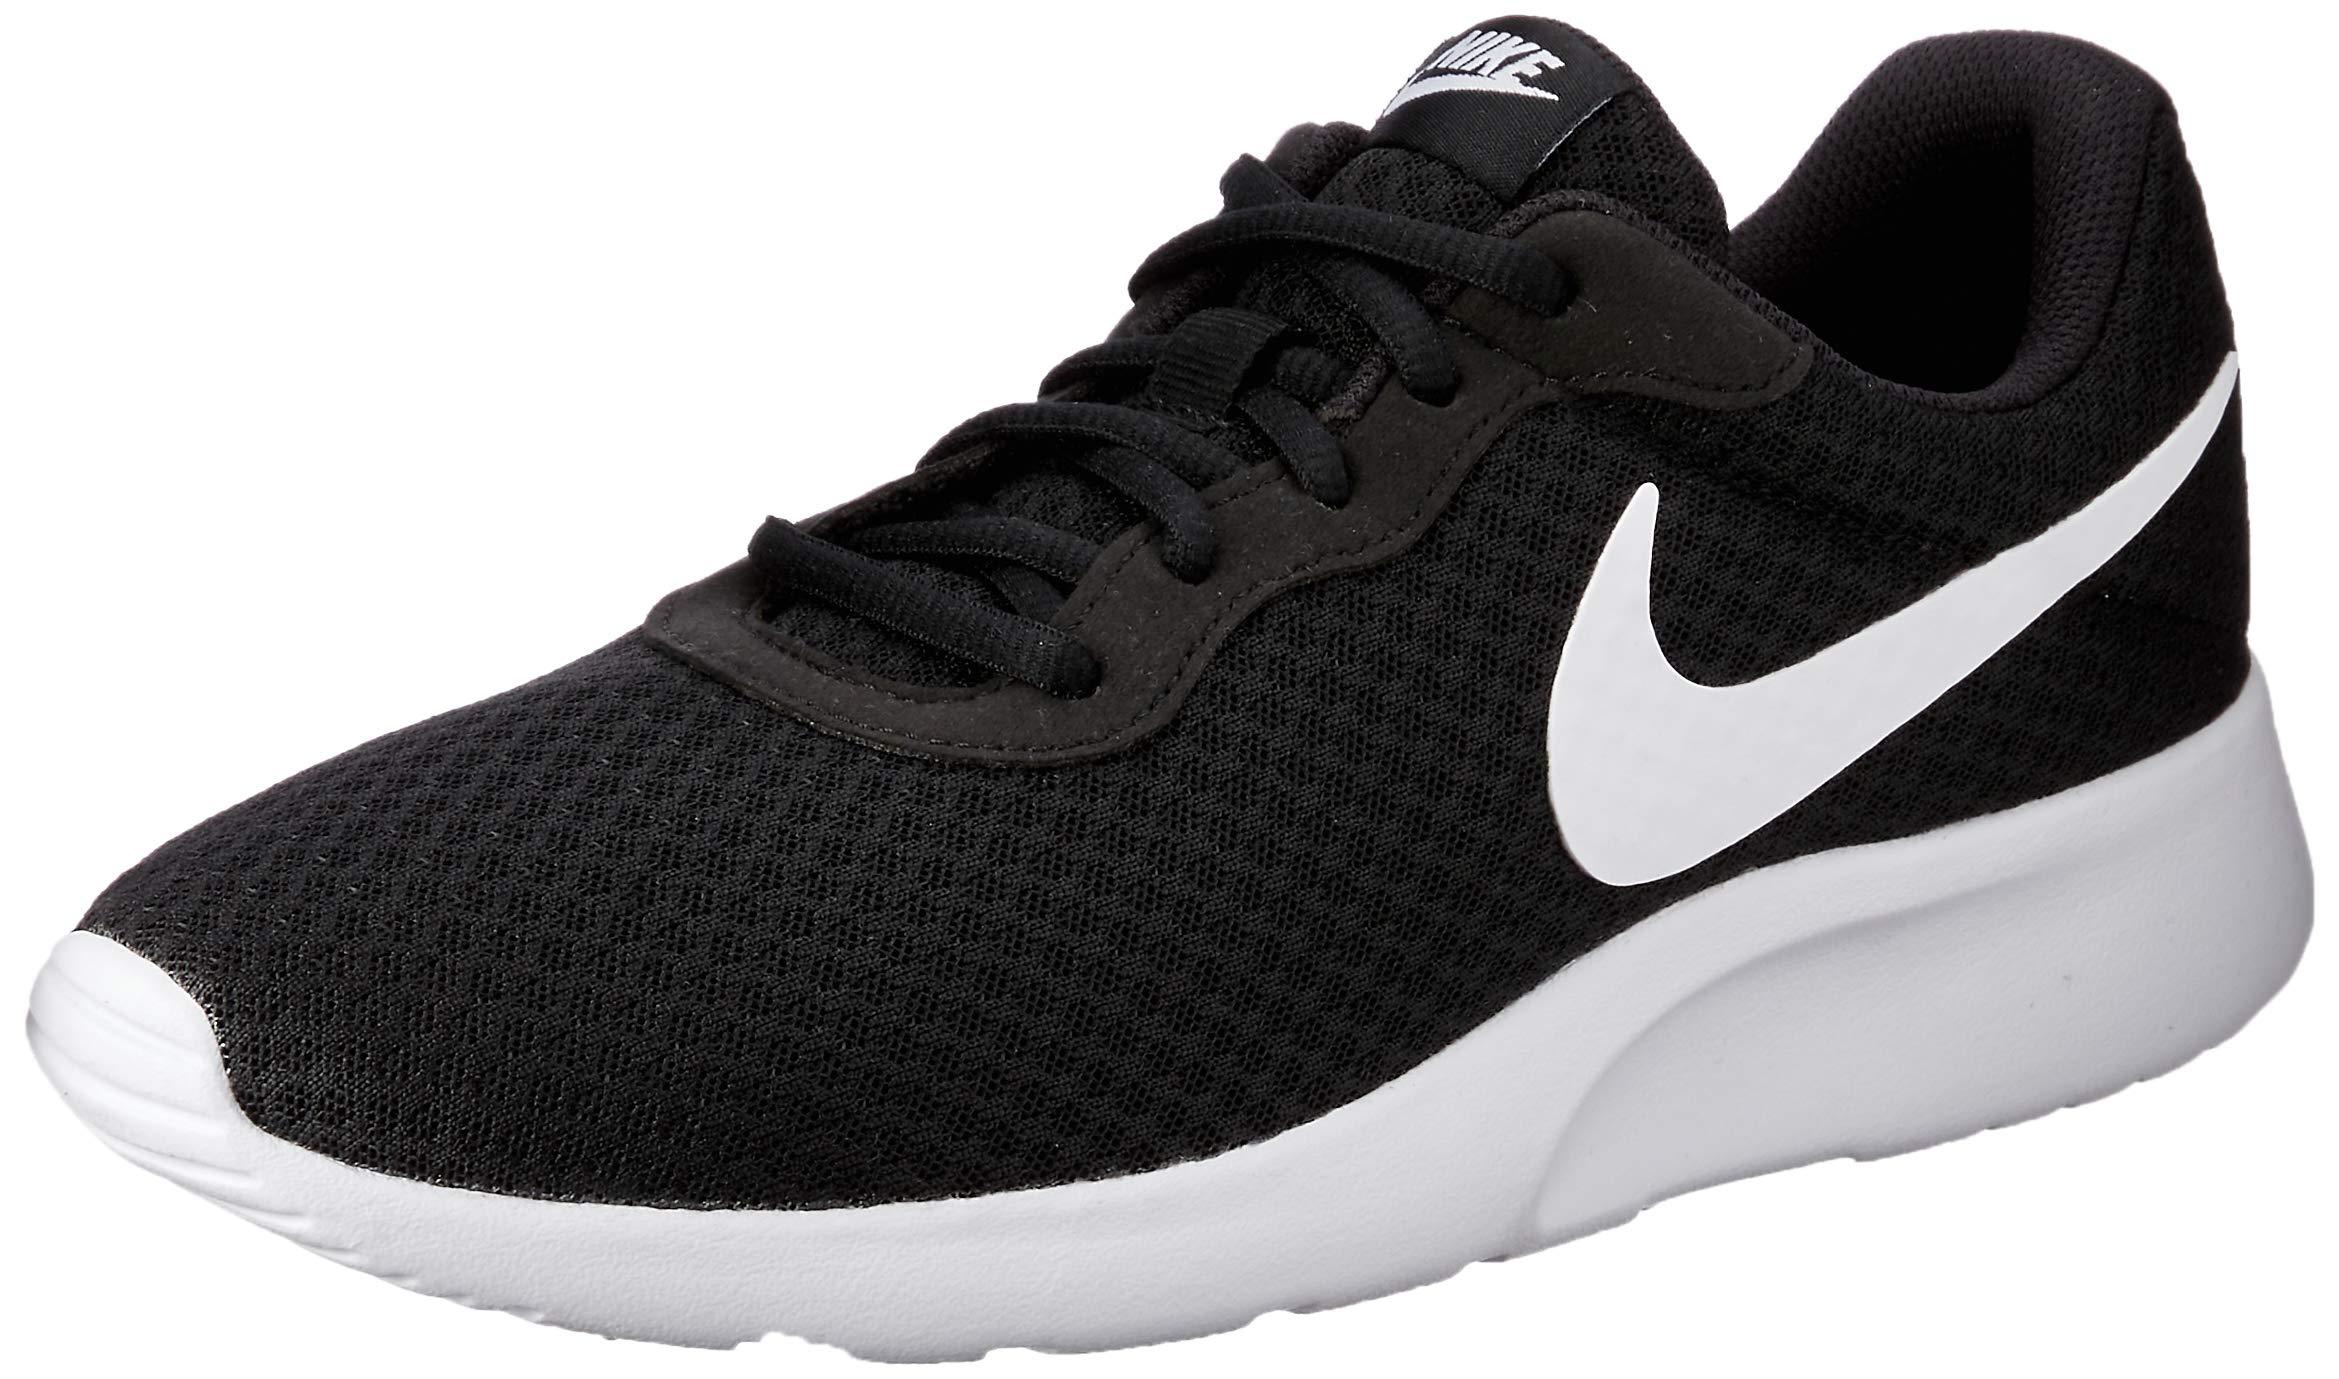 White Running Shoe Size 7.5 Men